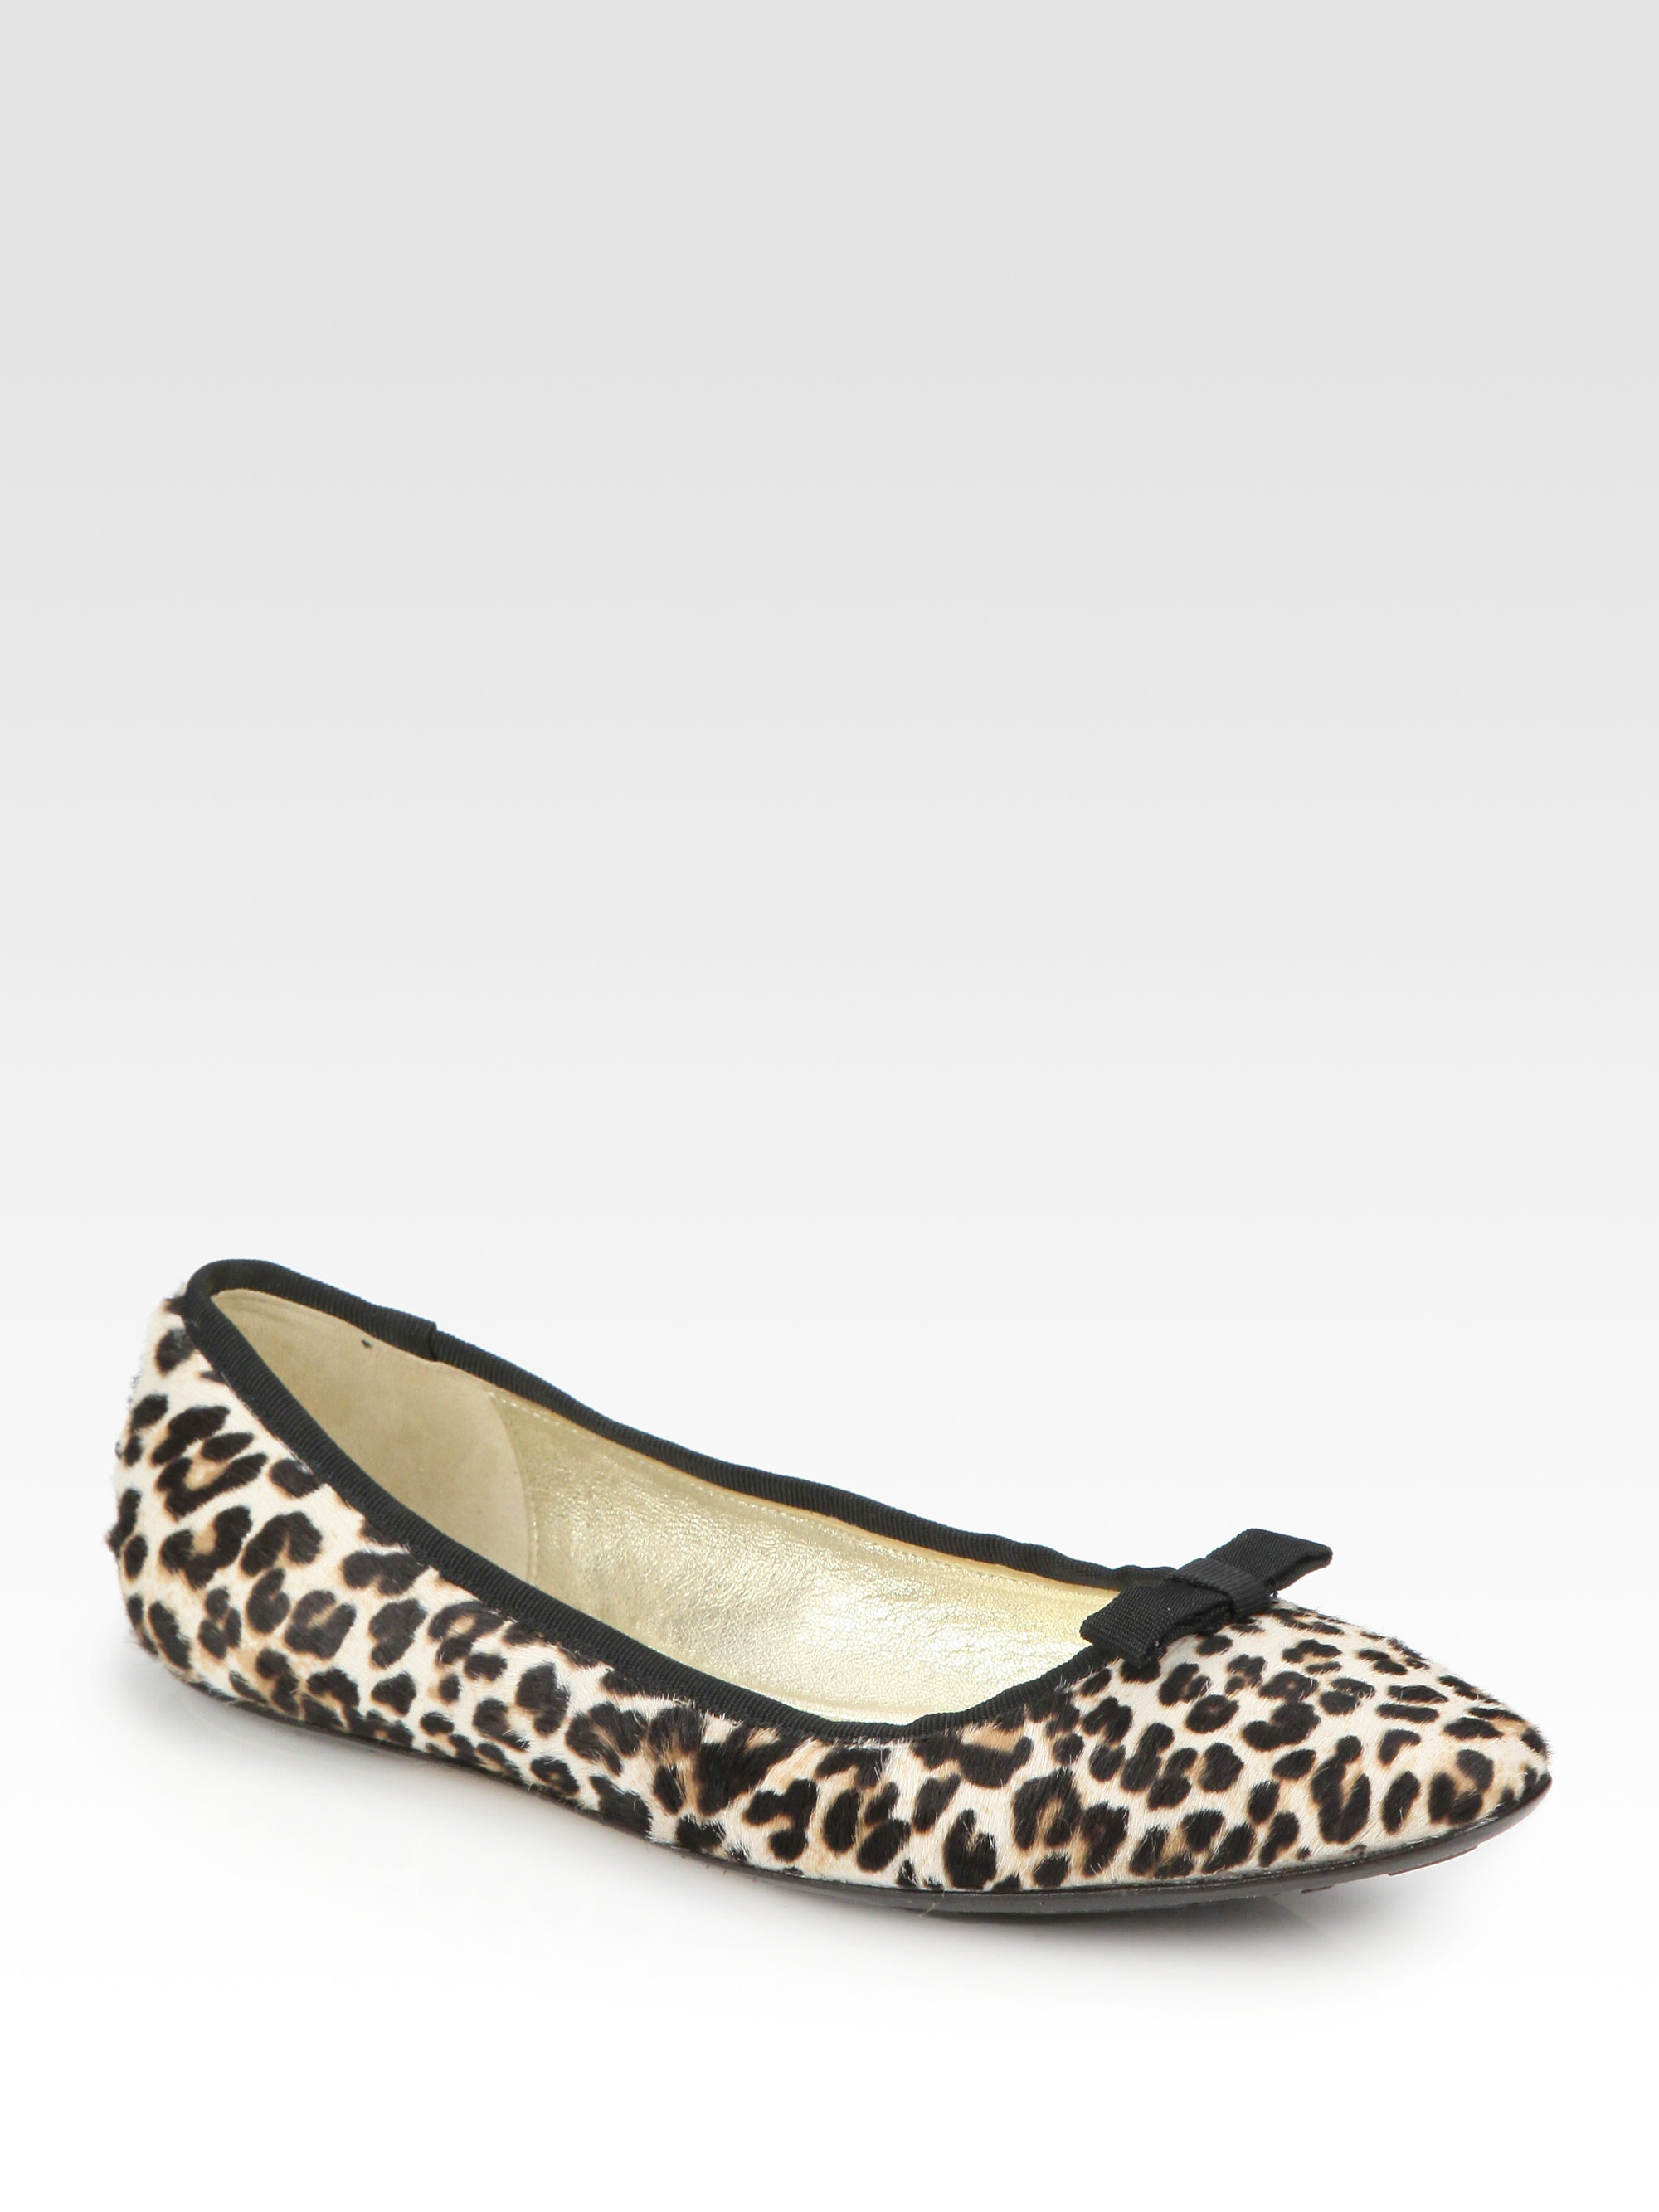 aedd3907cfc2 Lyst - Jimmy Choo Leopard-Print Calf Hair Ballet Flats in Natural